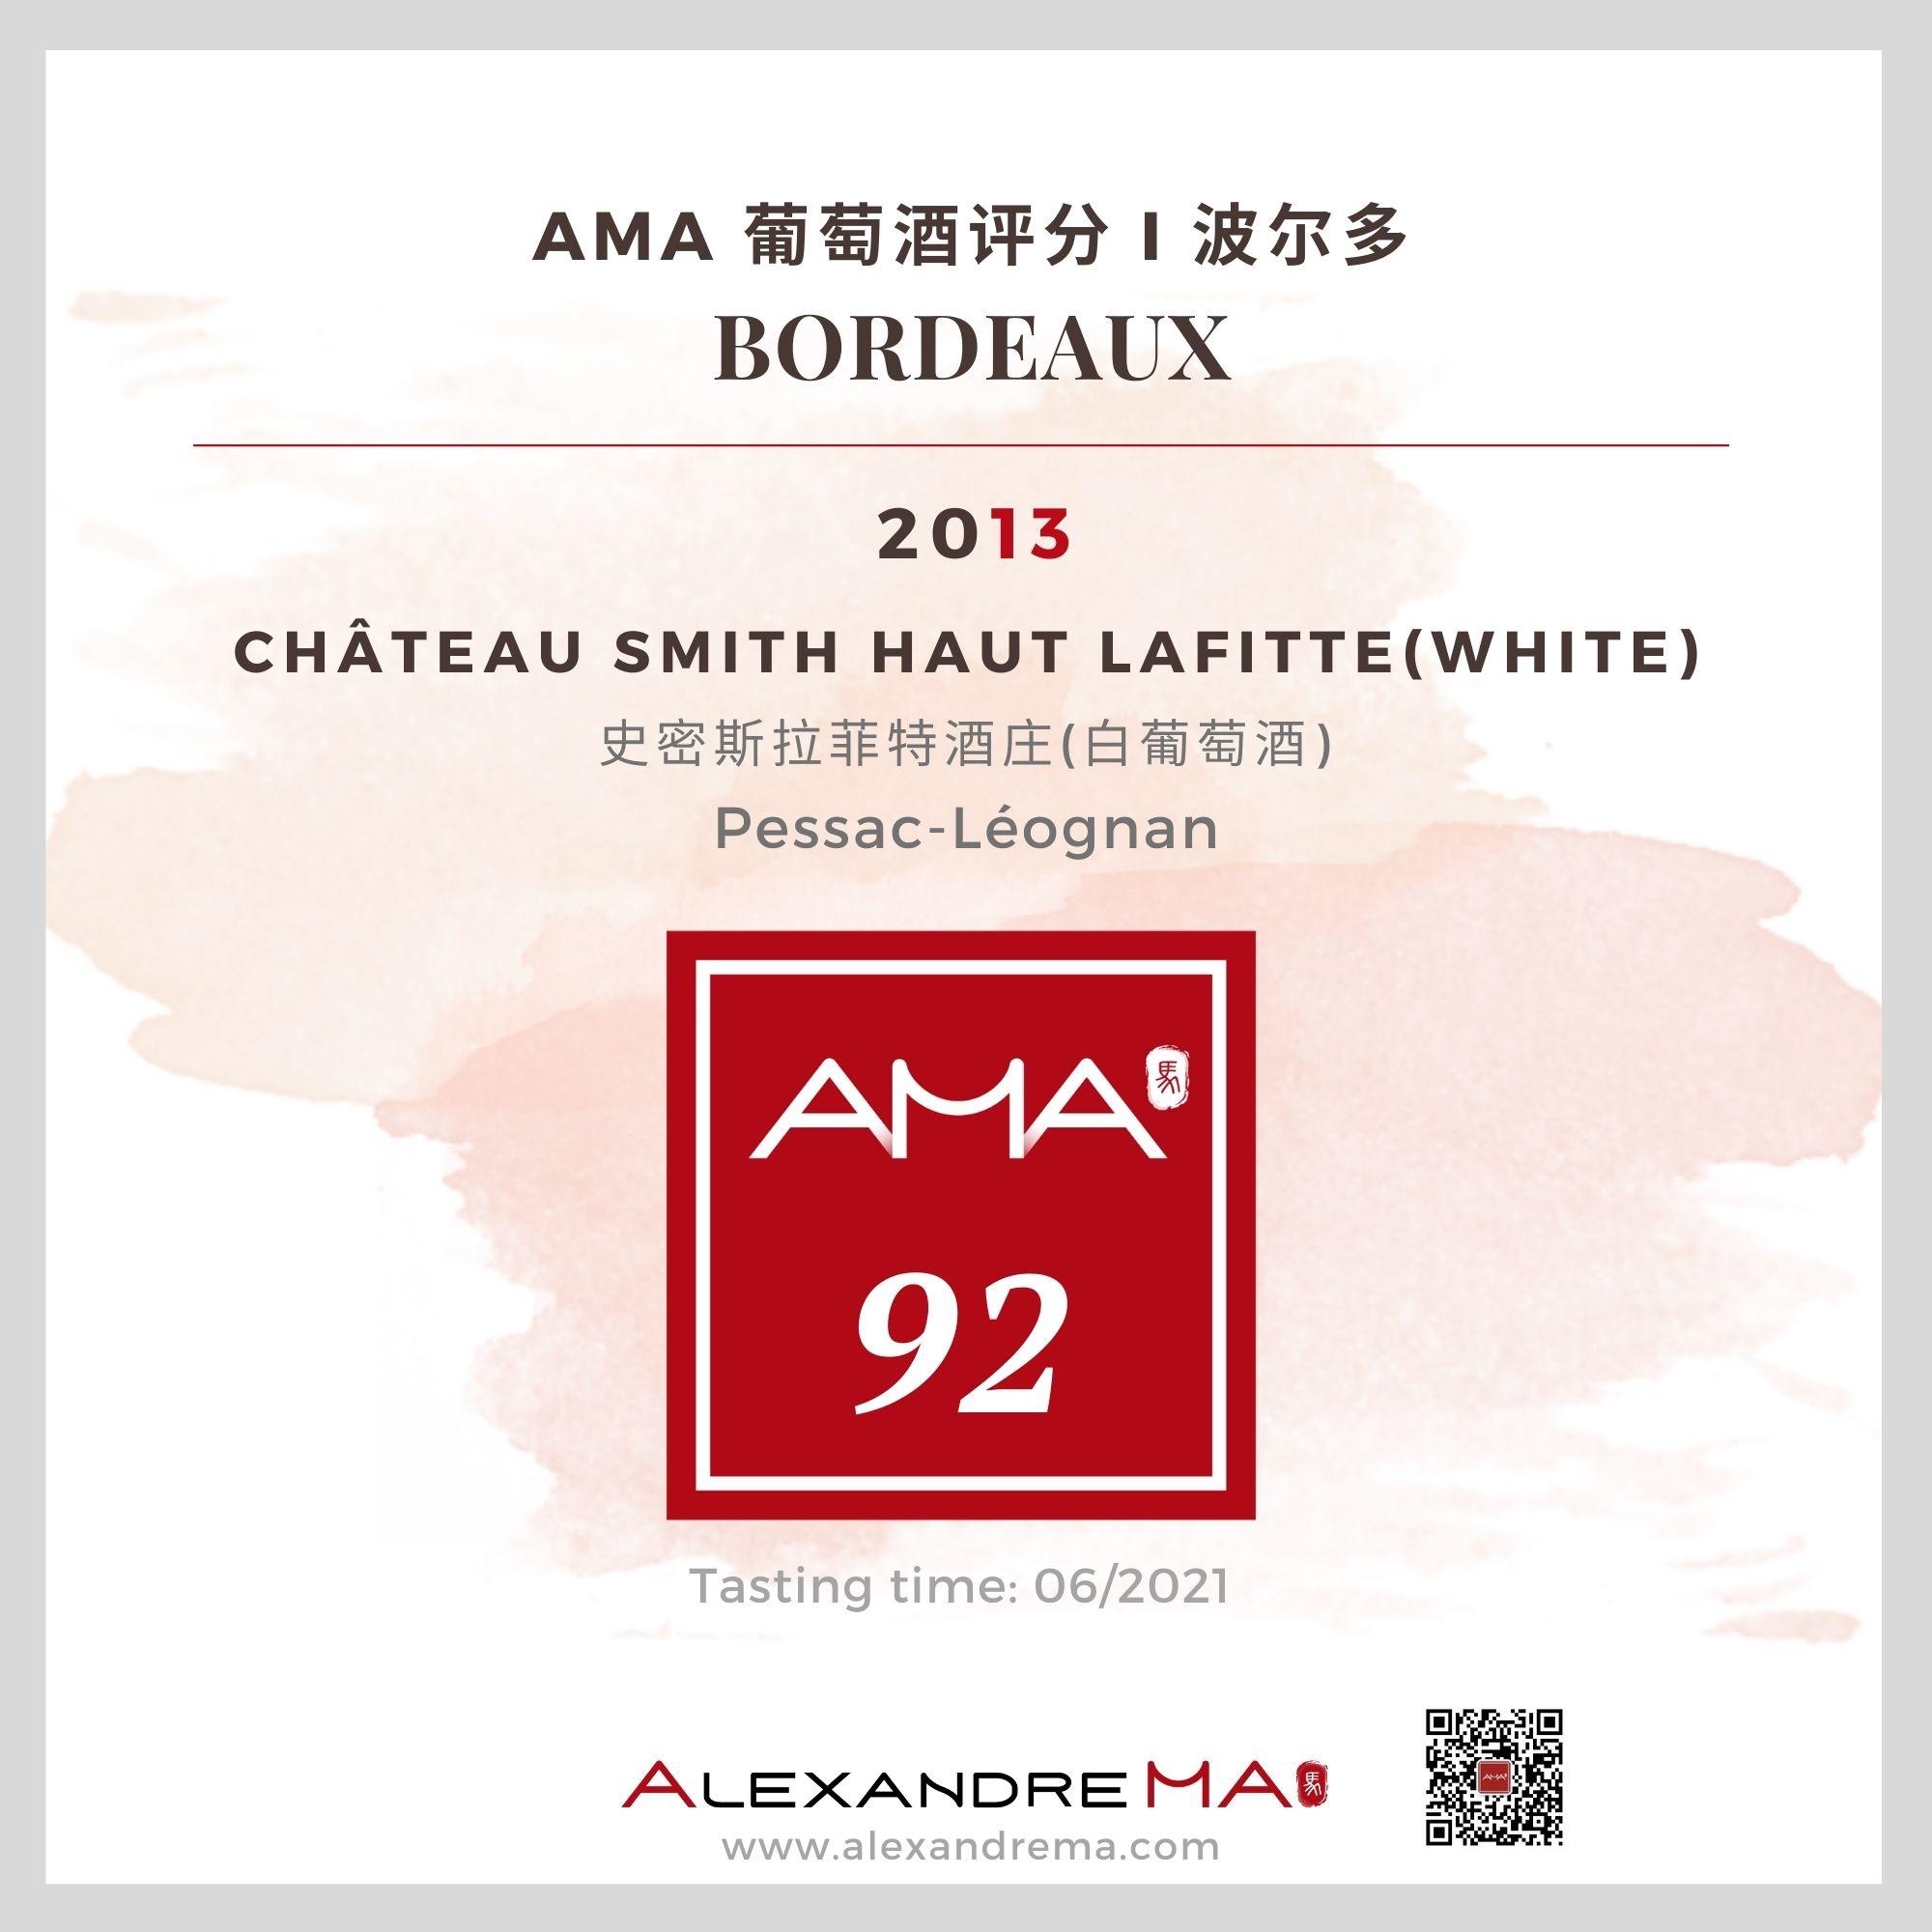 Château Smith Haut Lafitte White 2013 - Alexandre MA